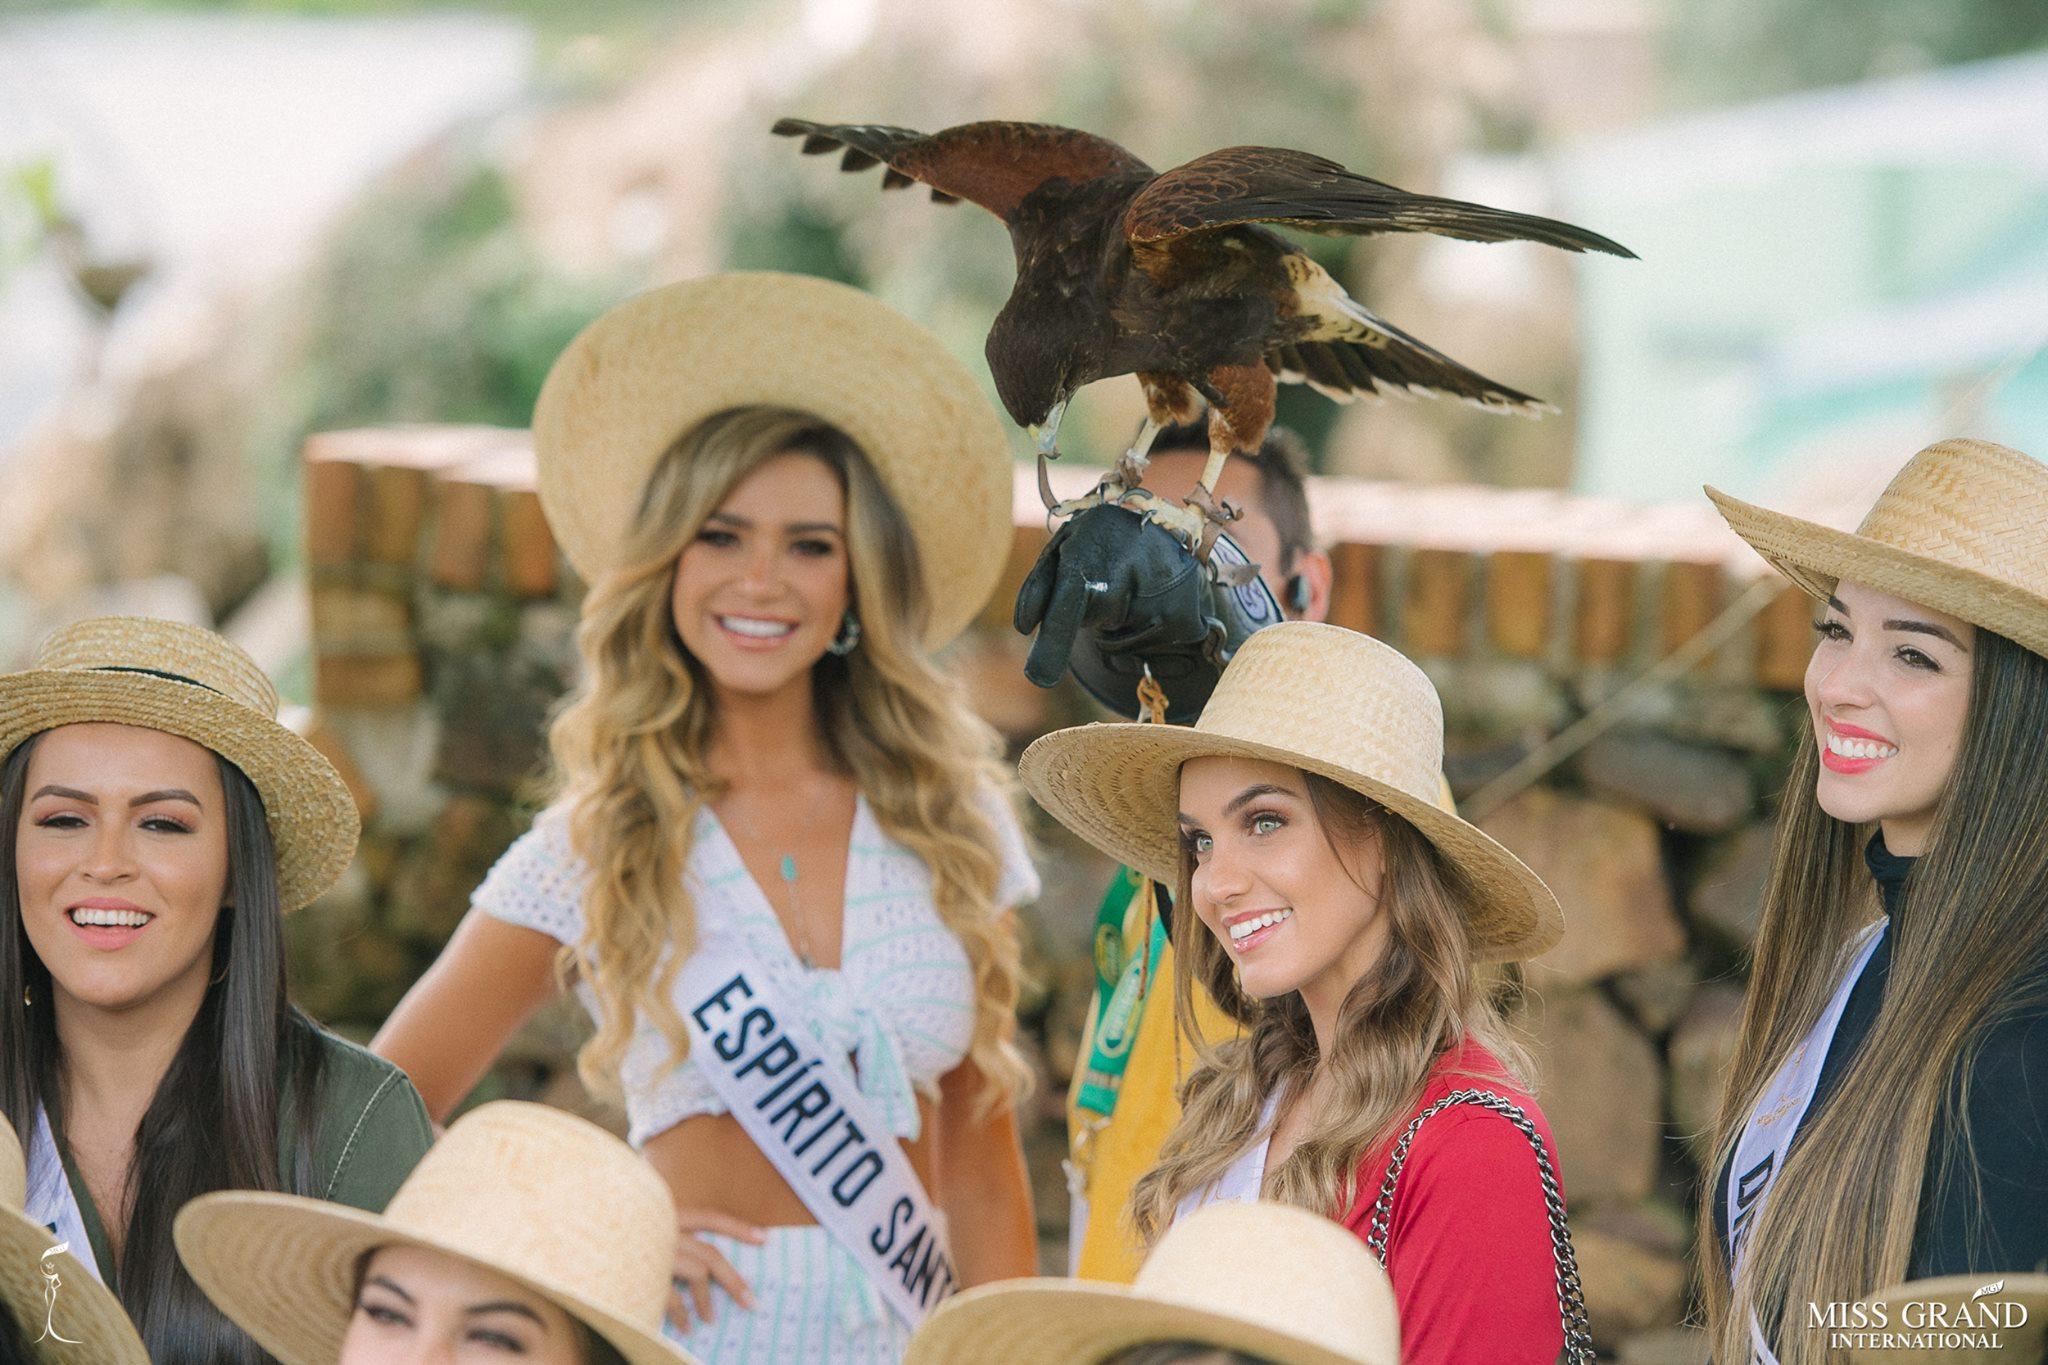 amanda cardoso, miss grand espirito santo 2019/3rd runner-up de miss intercontinental 2017. - Página 16 Alex-p70